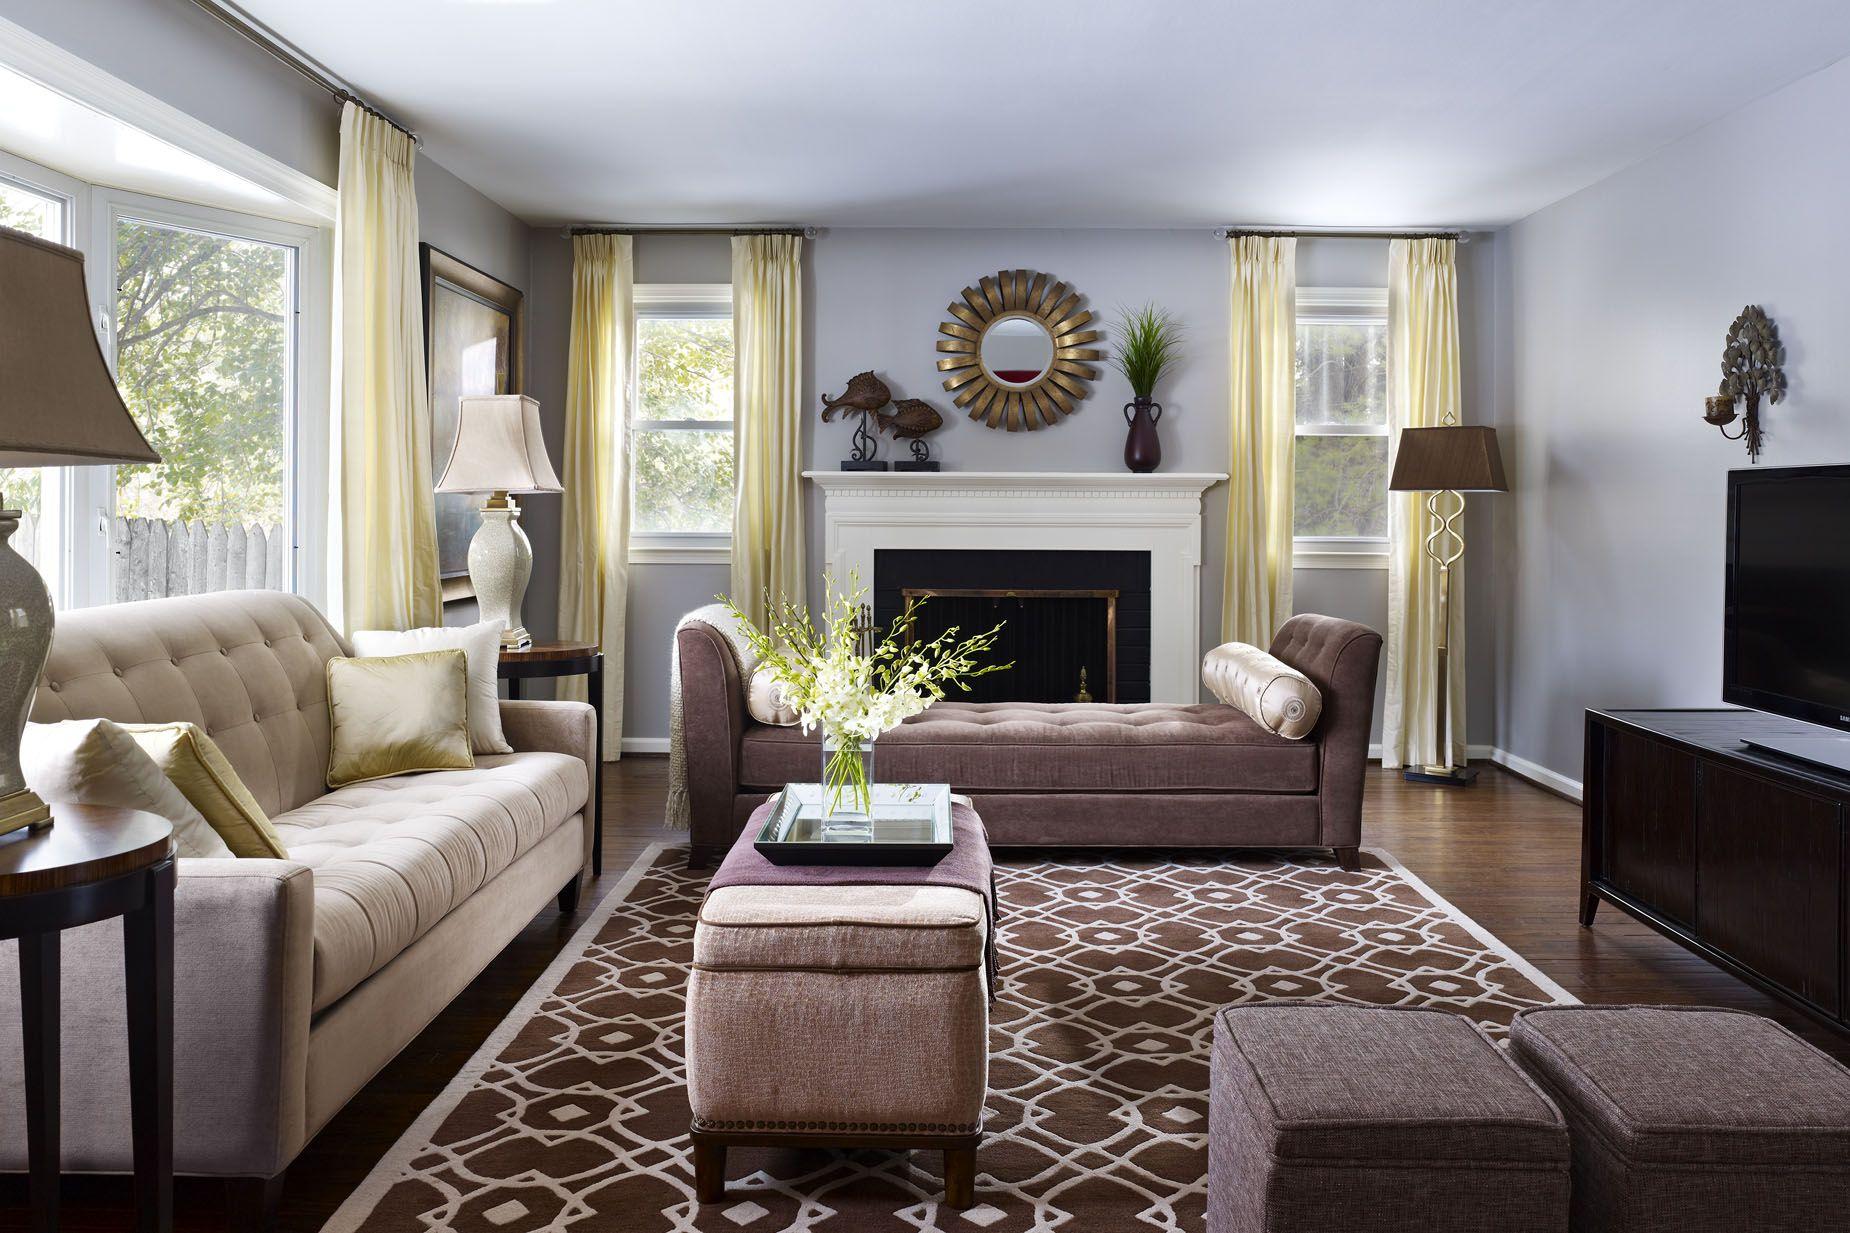 den furniture arrangements. Transitional Living Room By Decorating Den Interiors. The Color Scheme, Furniture Arrangement, Etc. Arrangements T